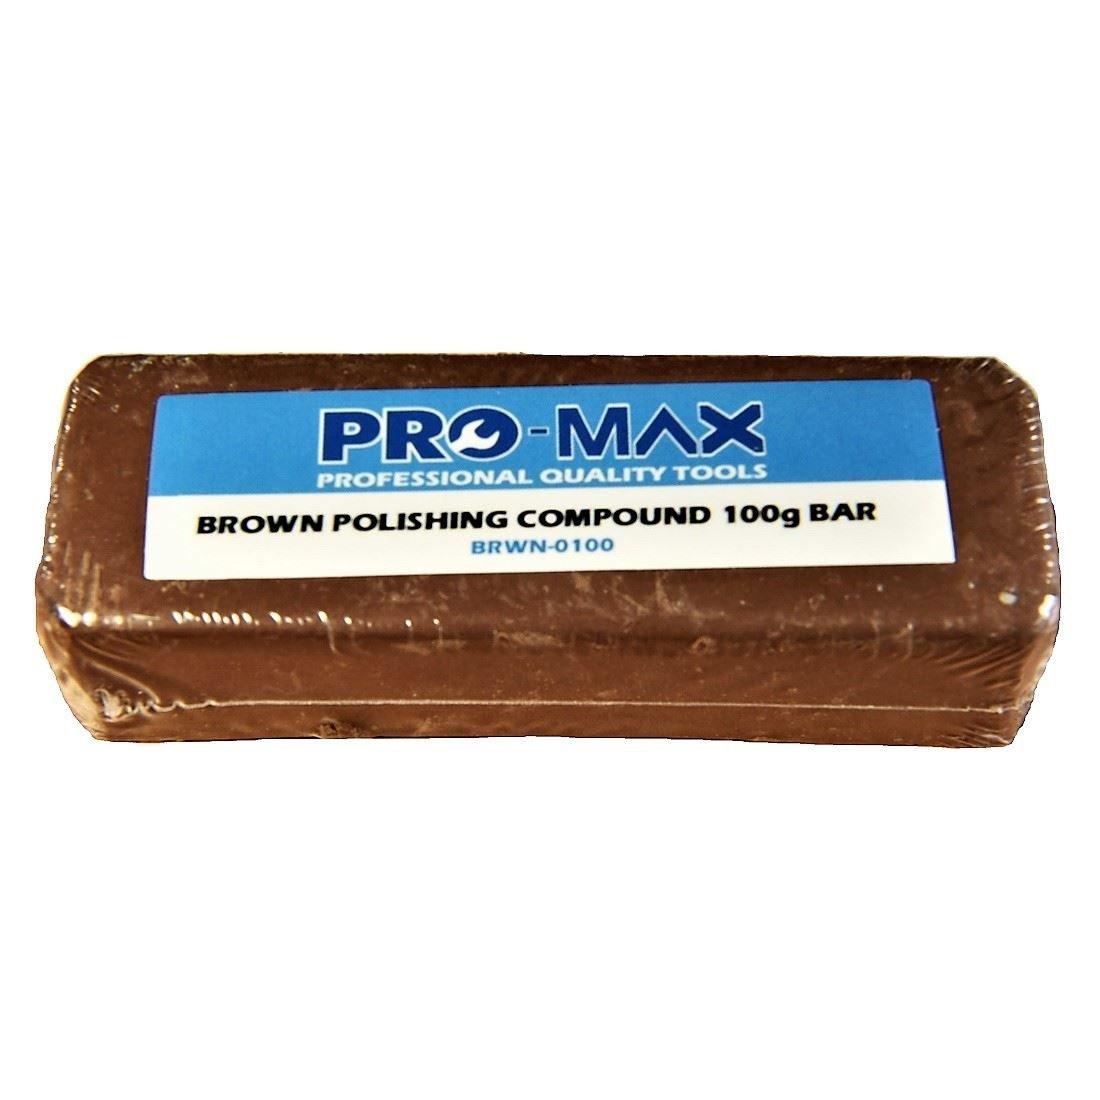 Pro-Max 100g Bar Brown Aluminium Alloy Brass Metal Polishing Buffing Compound Metal Polishing Supplies UK Ltd